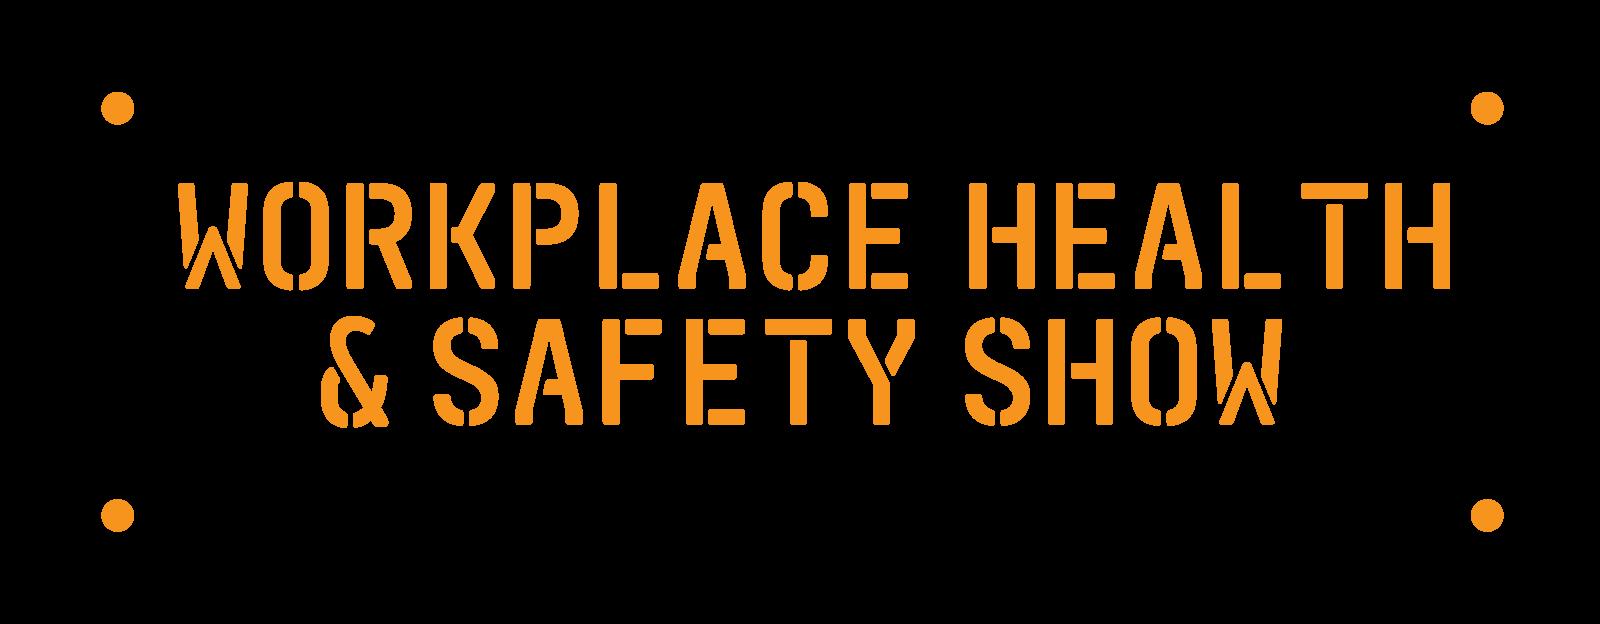 Workplace-Safety-Show-Logo